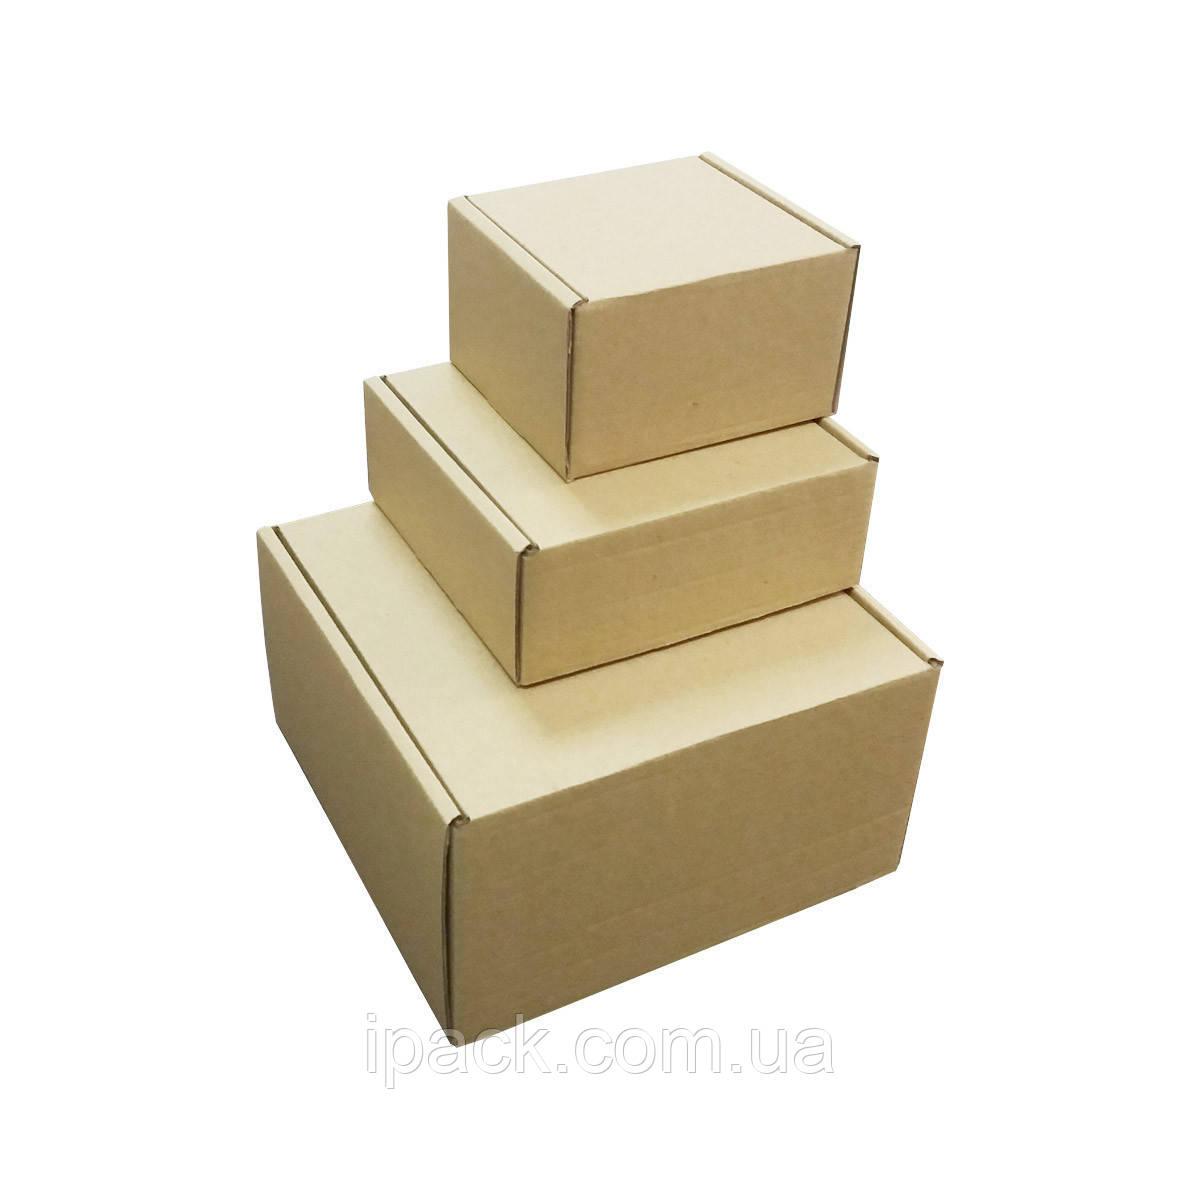 Коробка картонная самосборная, 100*70*90, мм, бурая, крафт, микрогофрокартон